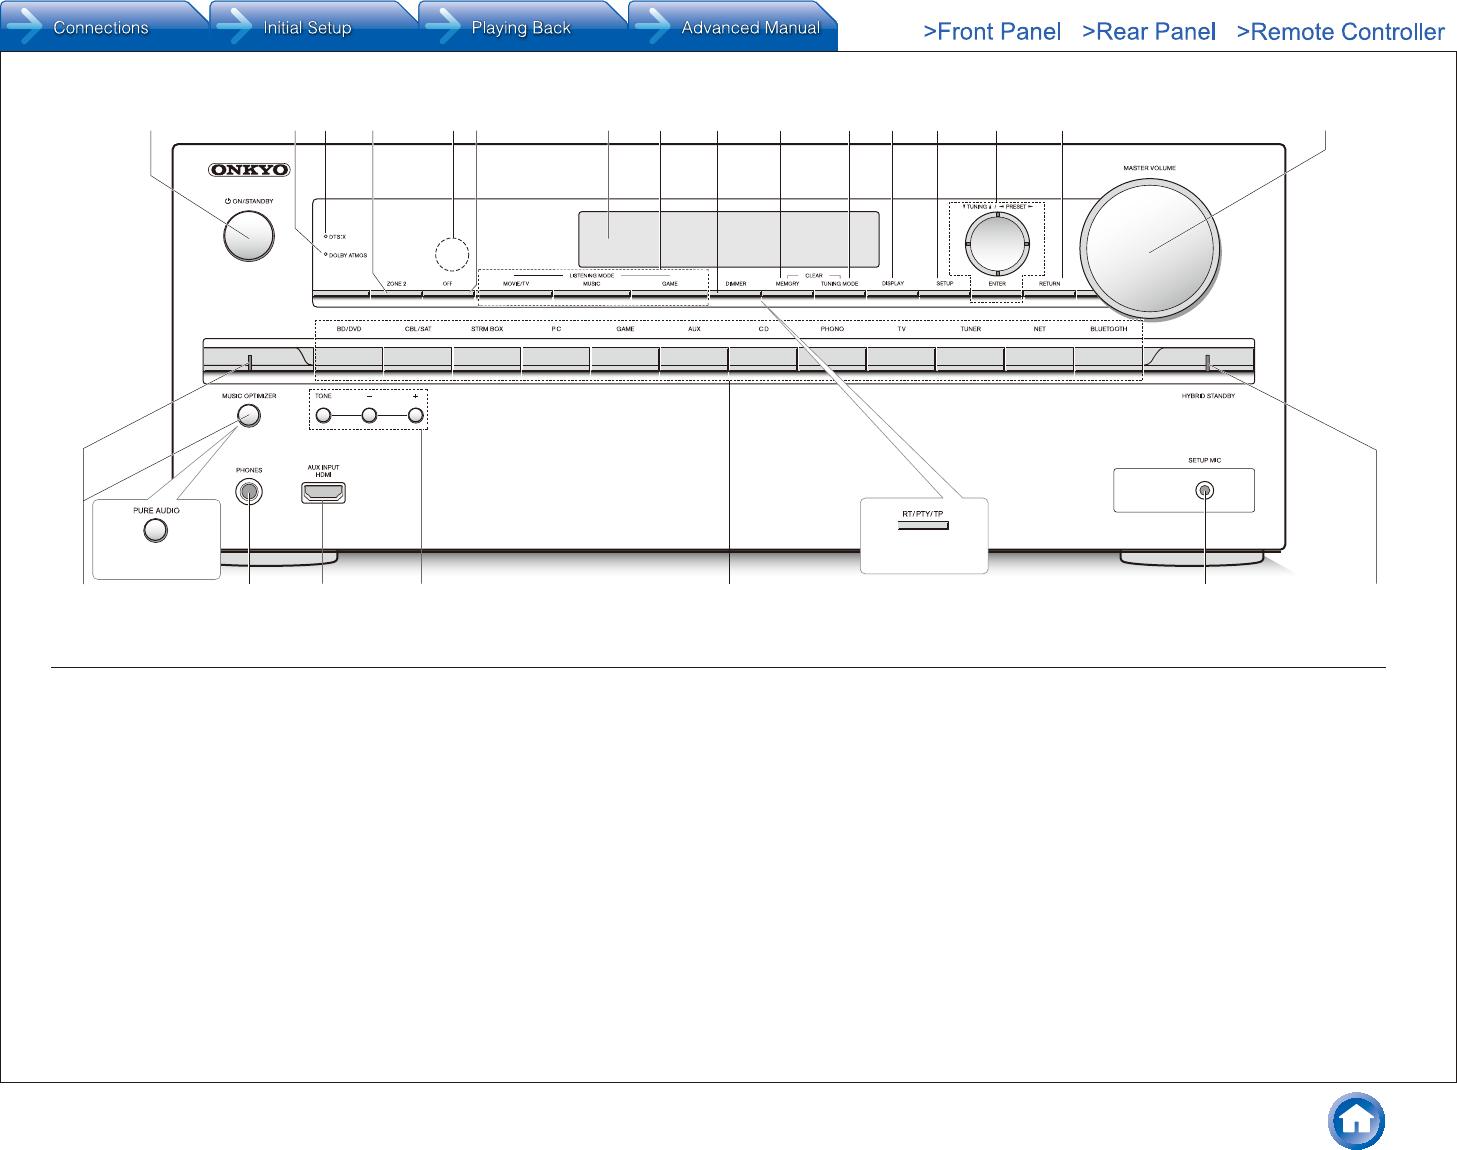 Lifetech skymaster driver download windows 10